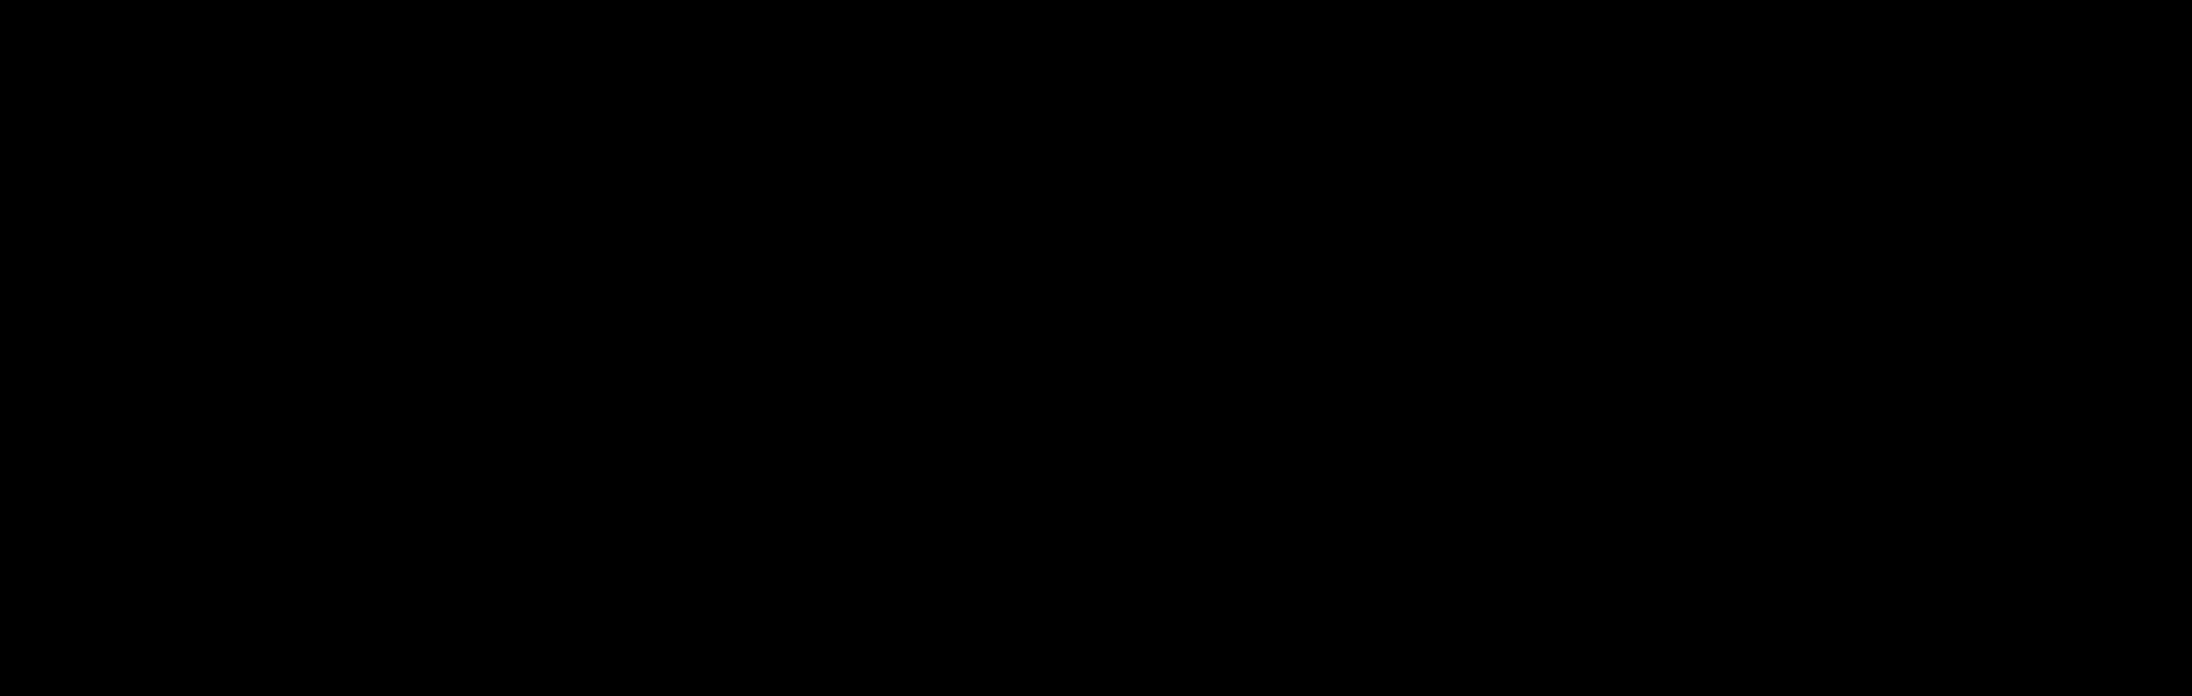 Homocapsaicin-I-d<sub>3</sub>